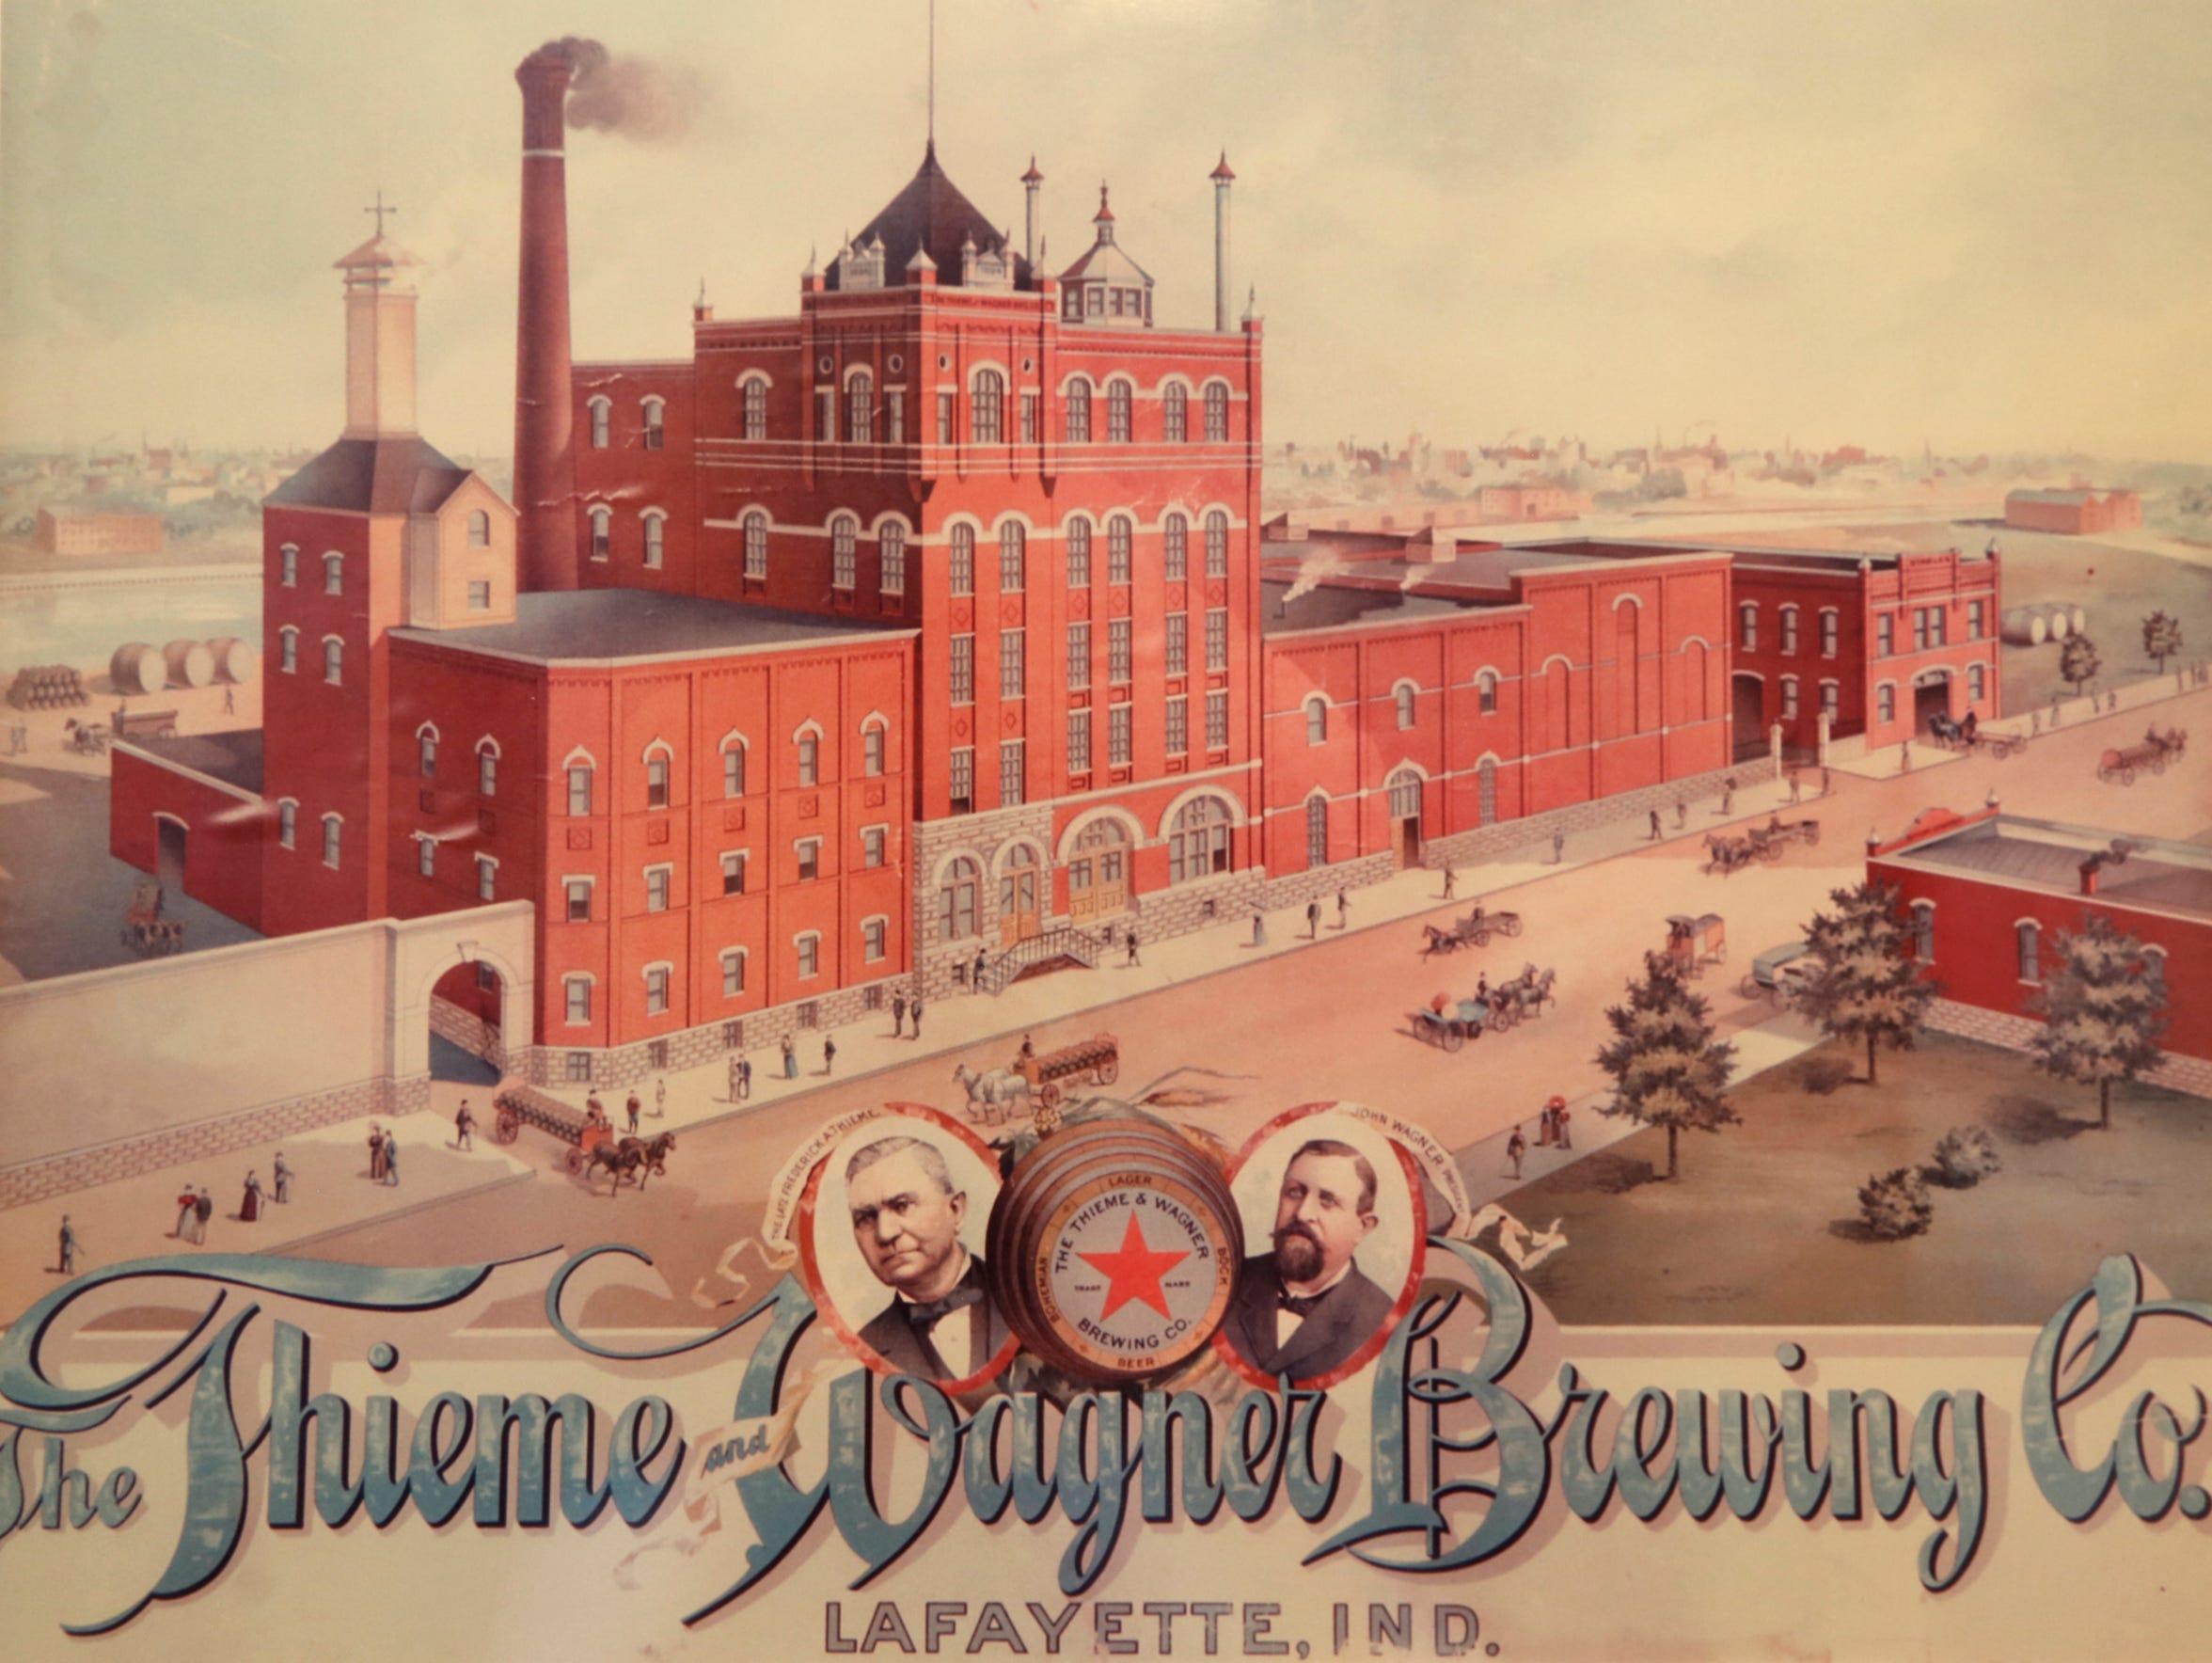 Thieme & Wagner beer memorabilia that is part of Walt